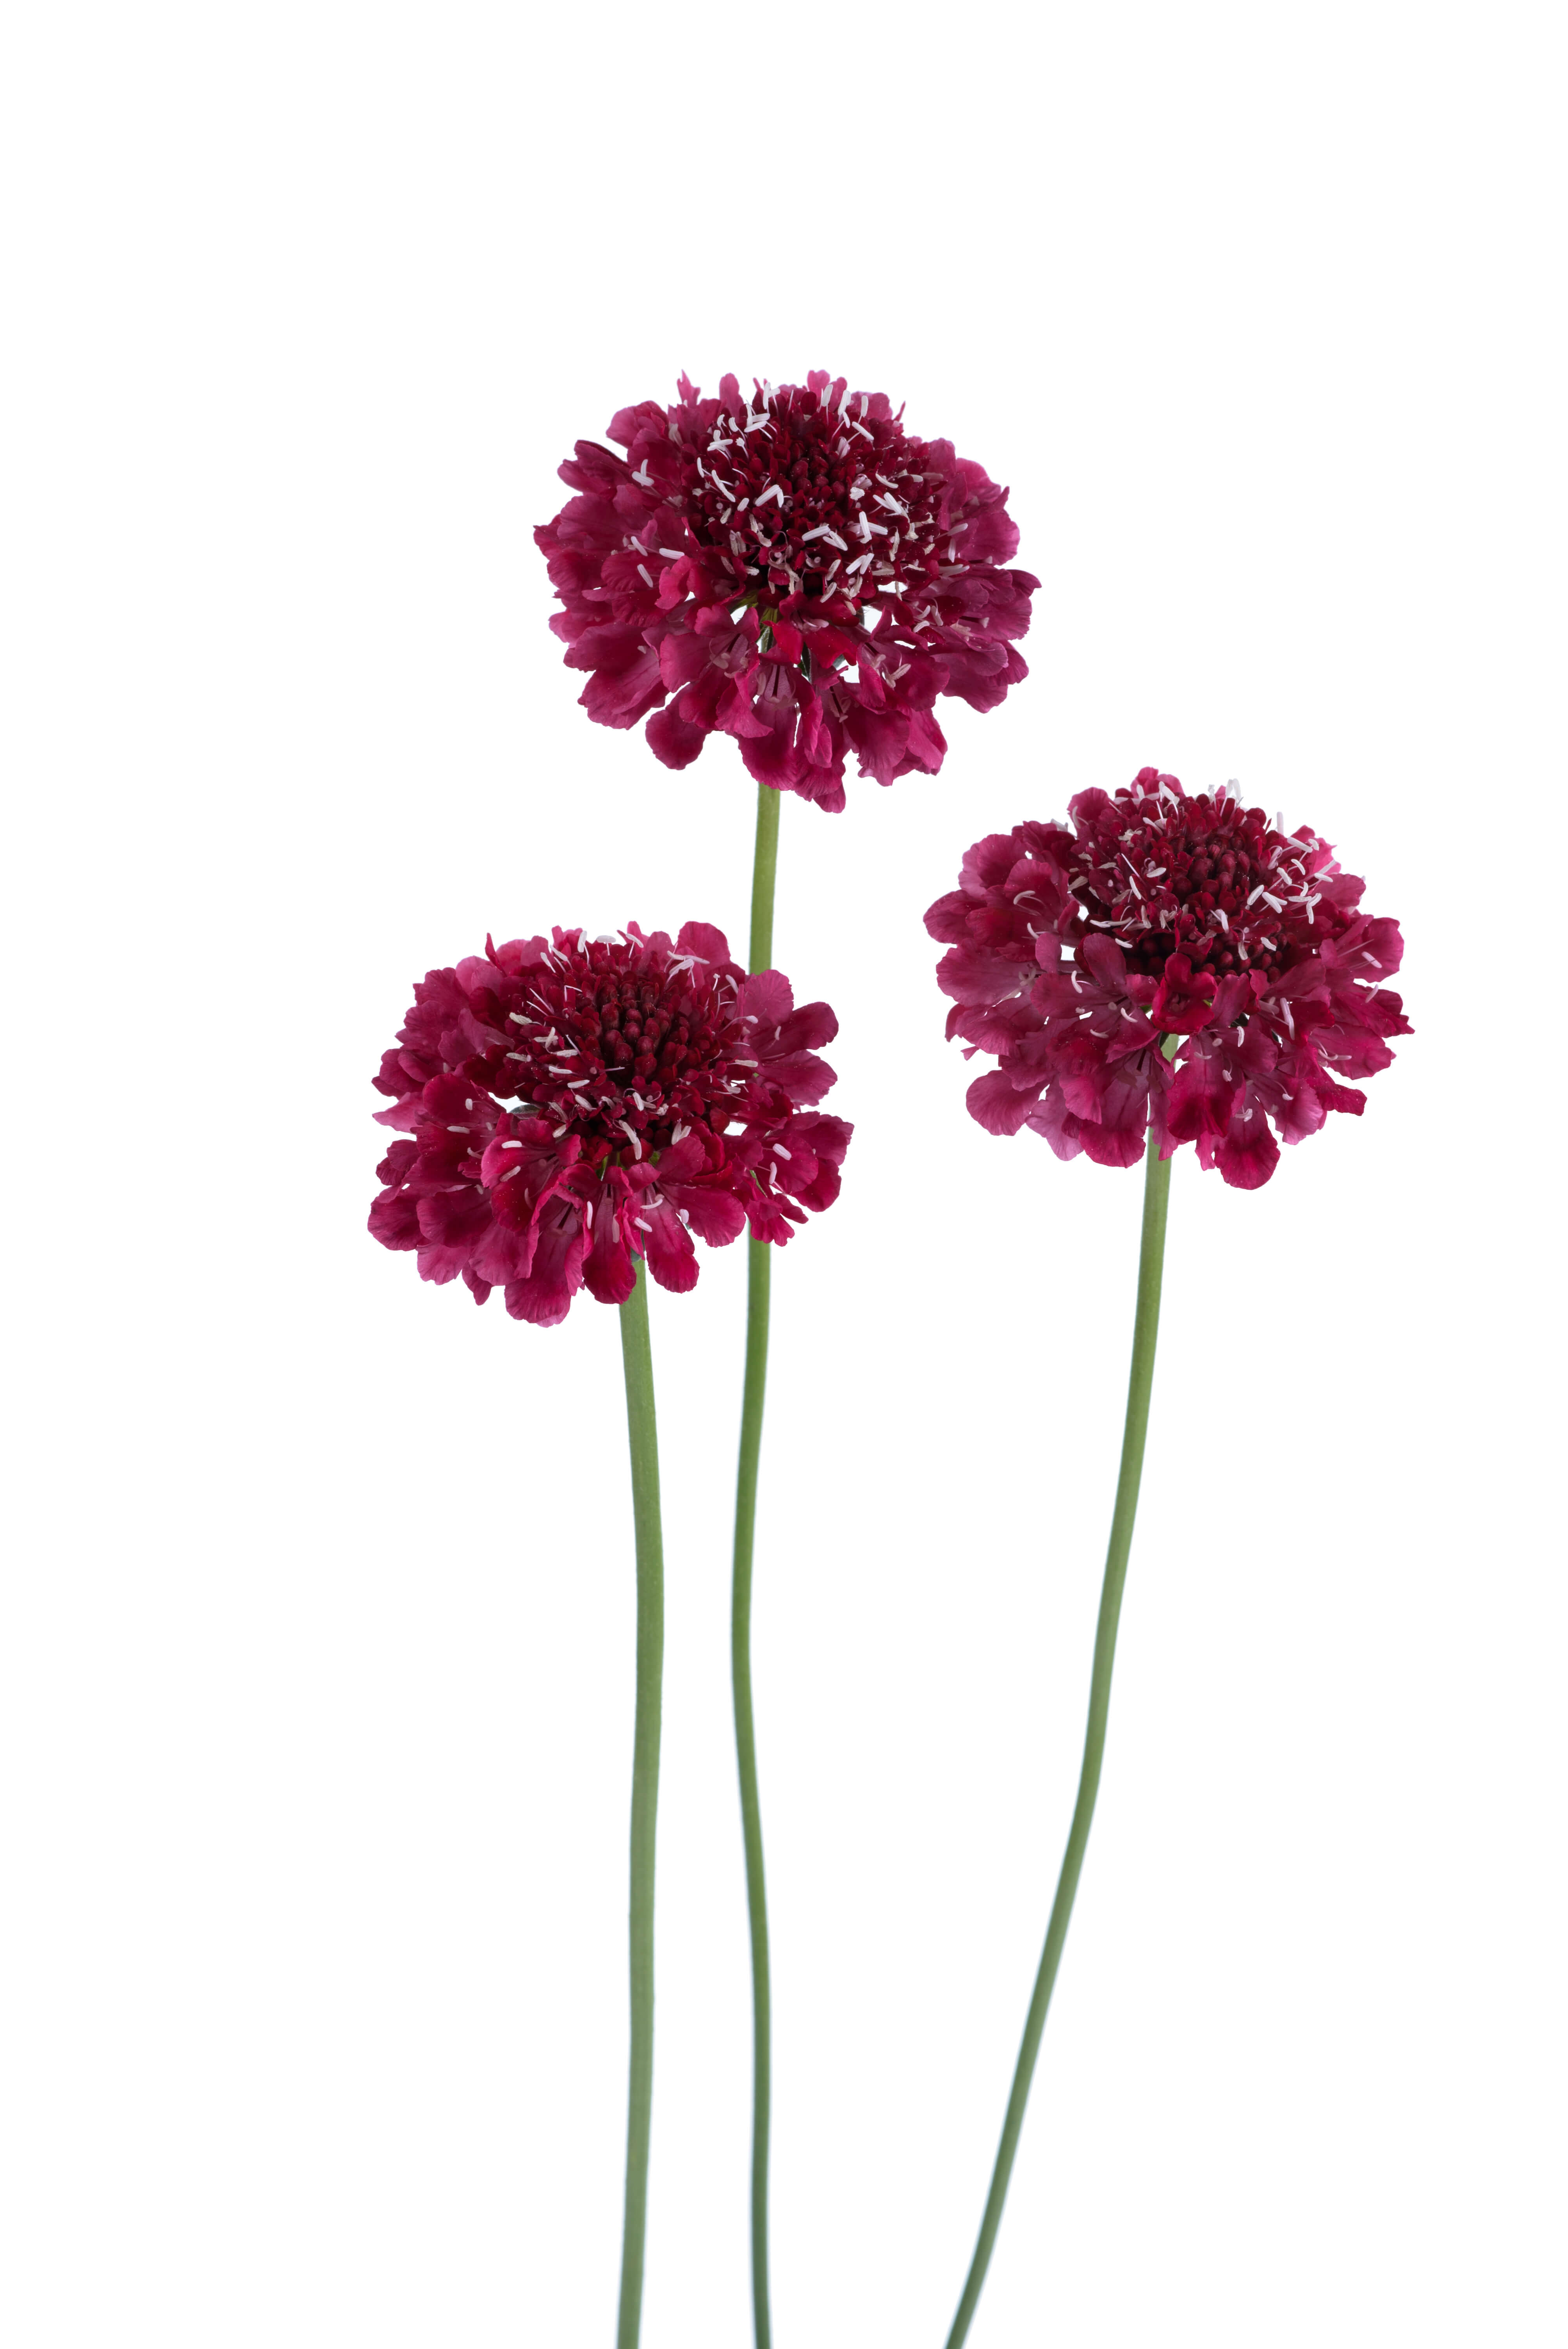 Scabiosa Scoop Series Pincushion Flower Cut Flowers Danziger